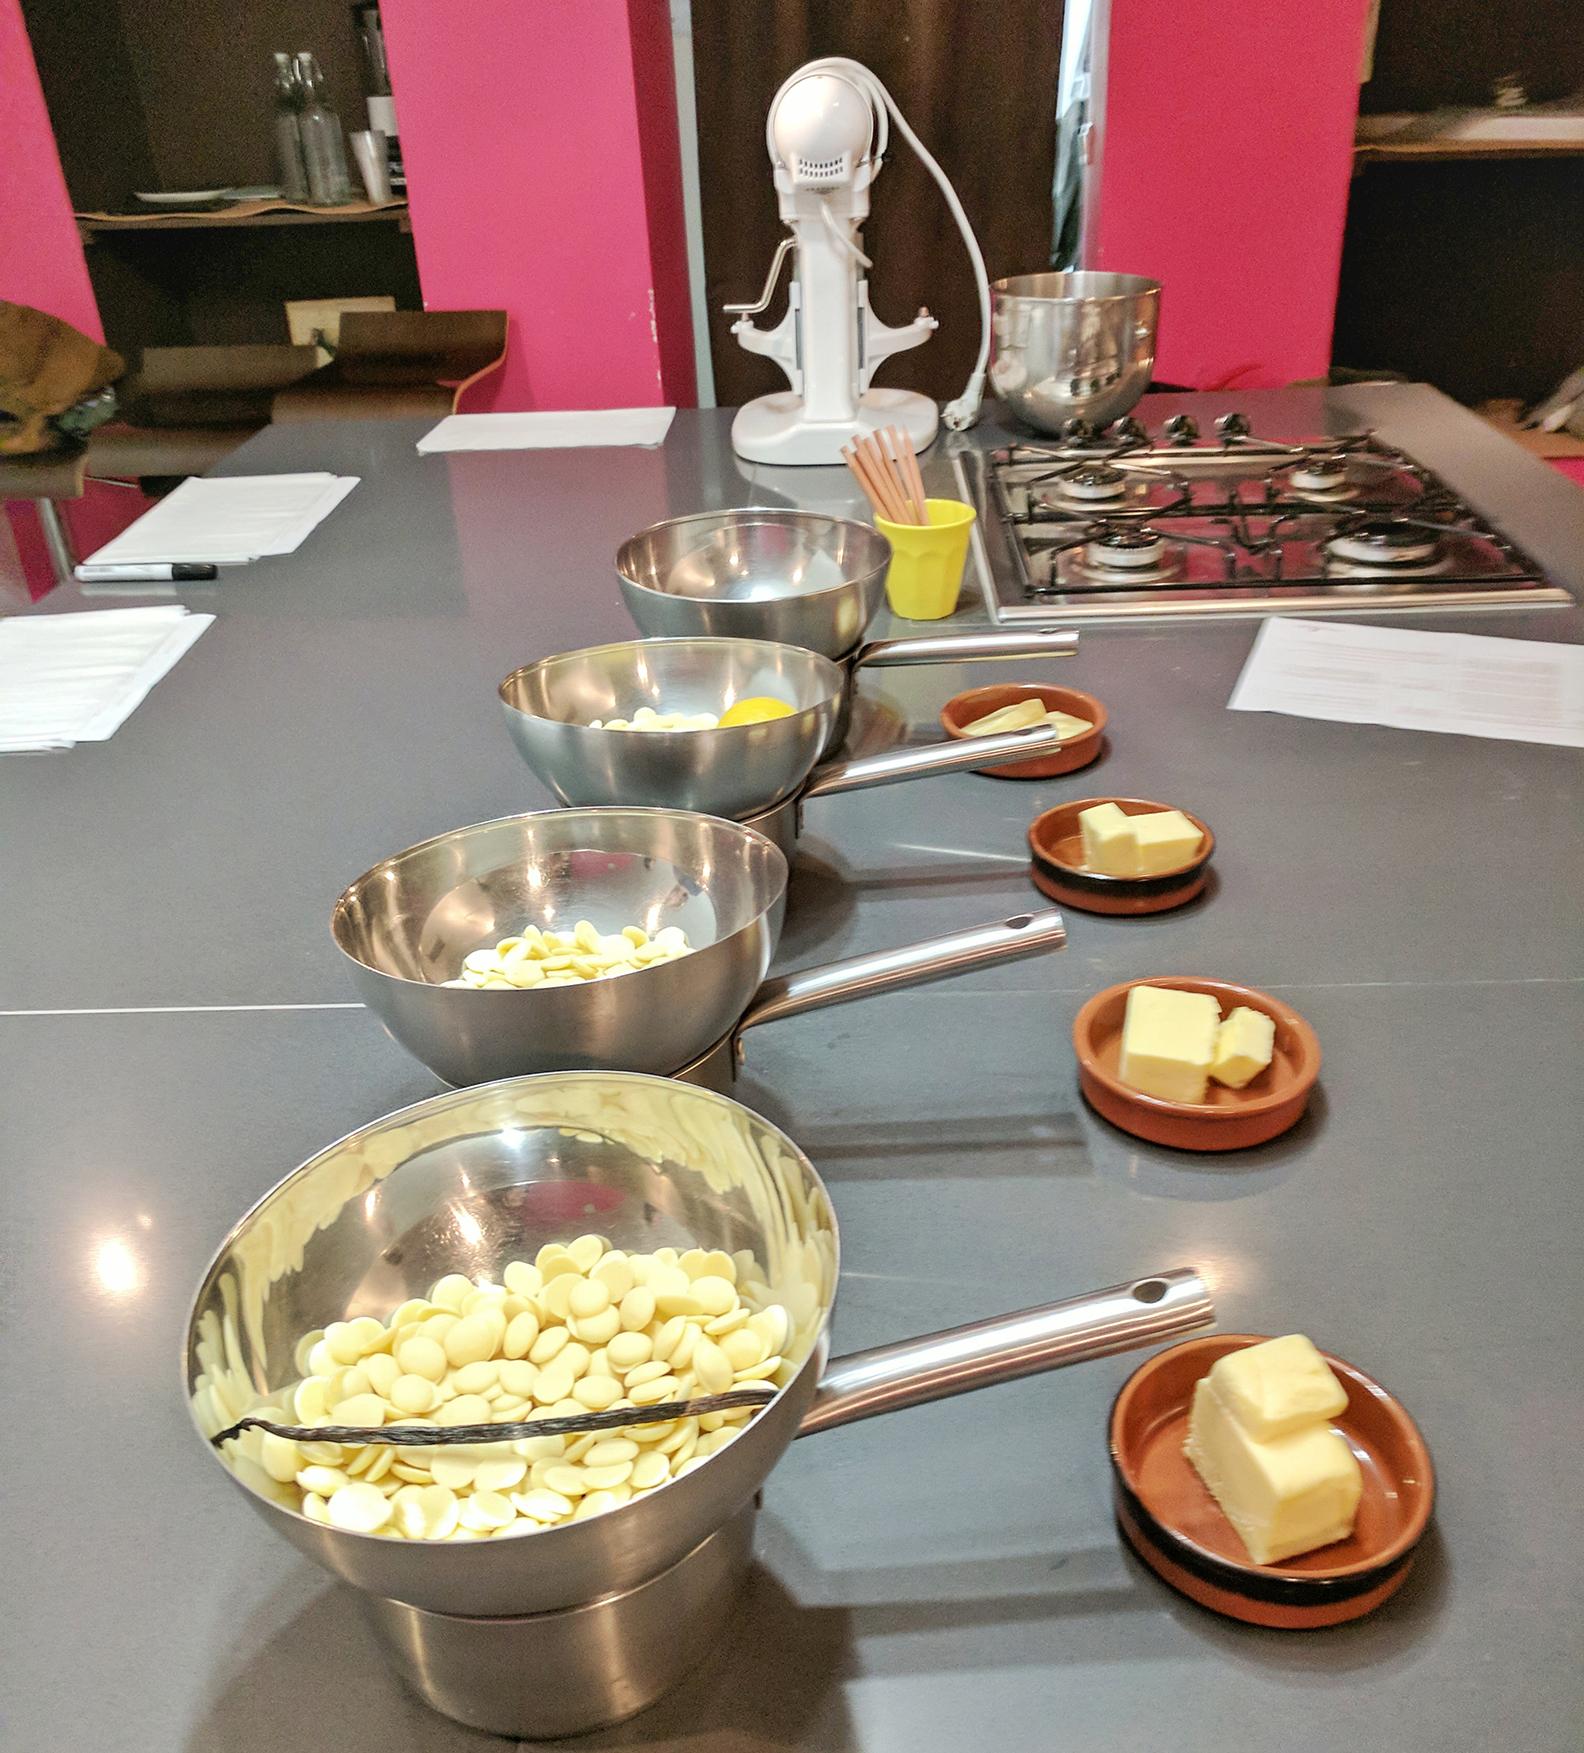 la-cuisine-kitchen.jpg